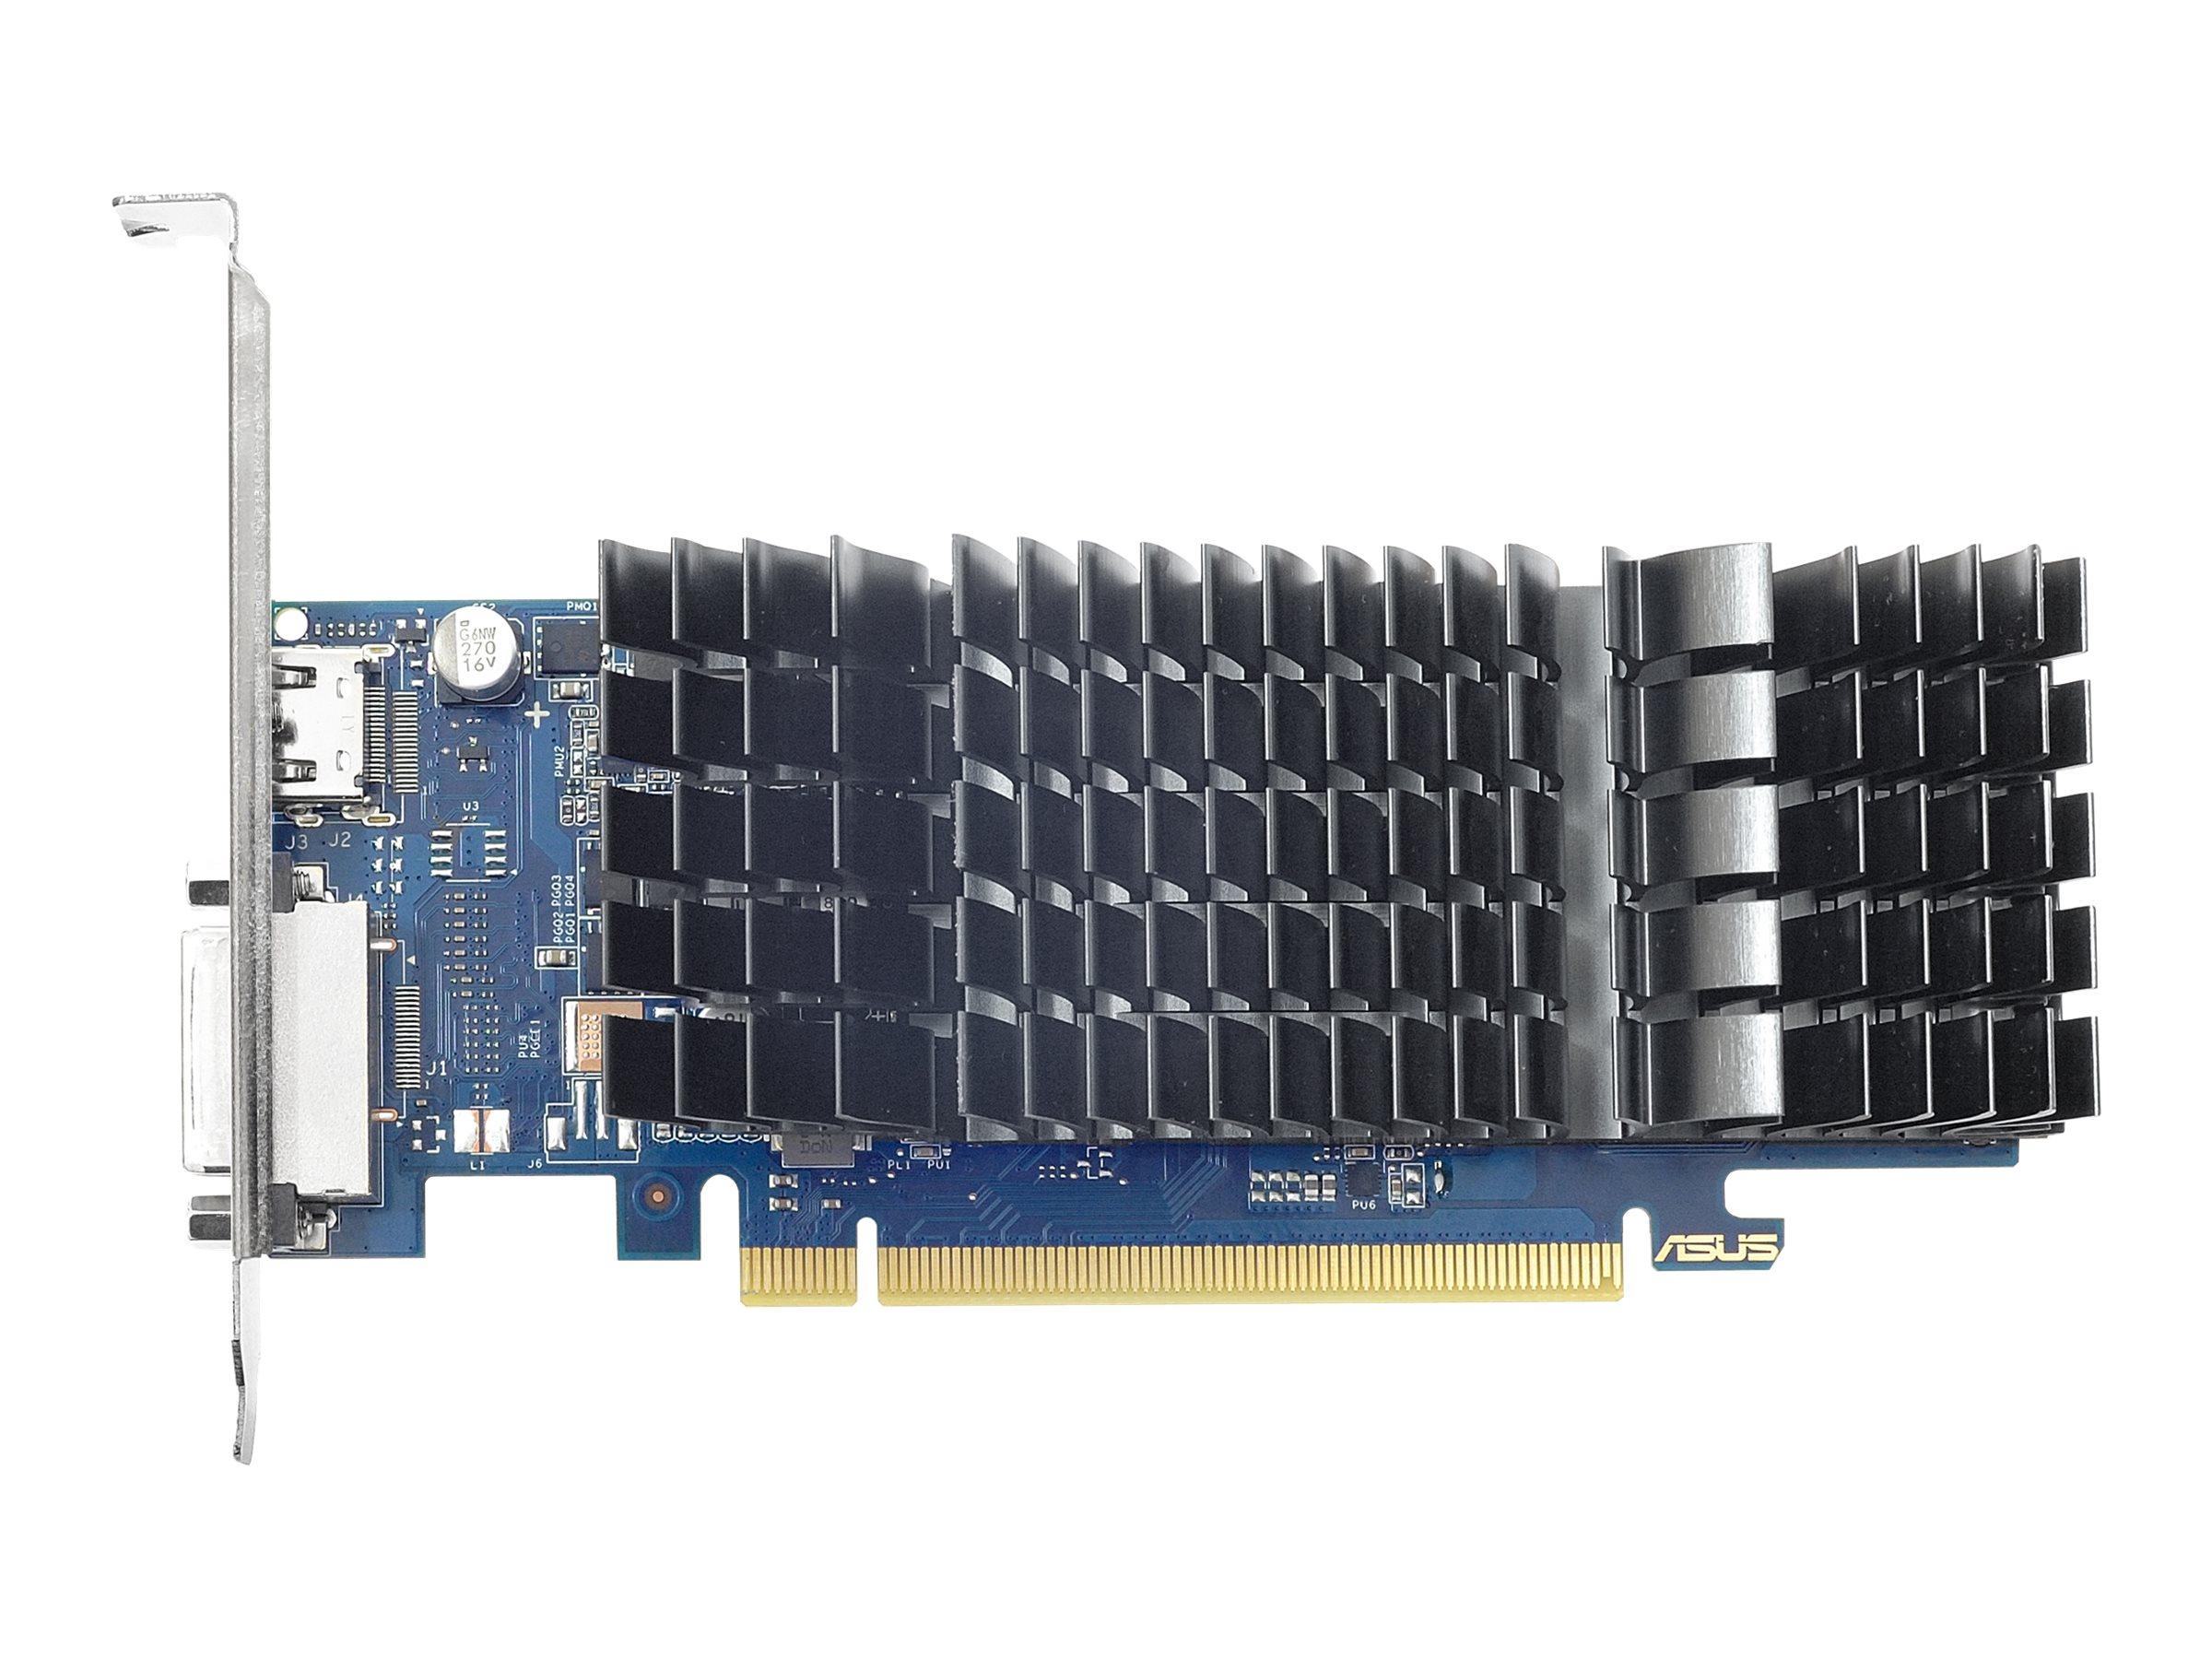 ASUS GT1030-SL-2G-BRK - Grafikkarten - GF GT 1030 - 2 GB GDDR5 - PCIe 3.0 Low-Profile - DVI, HDMI